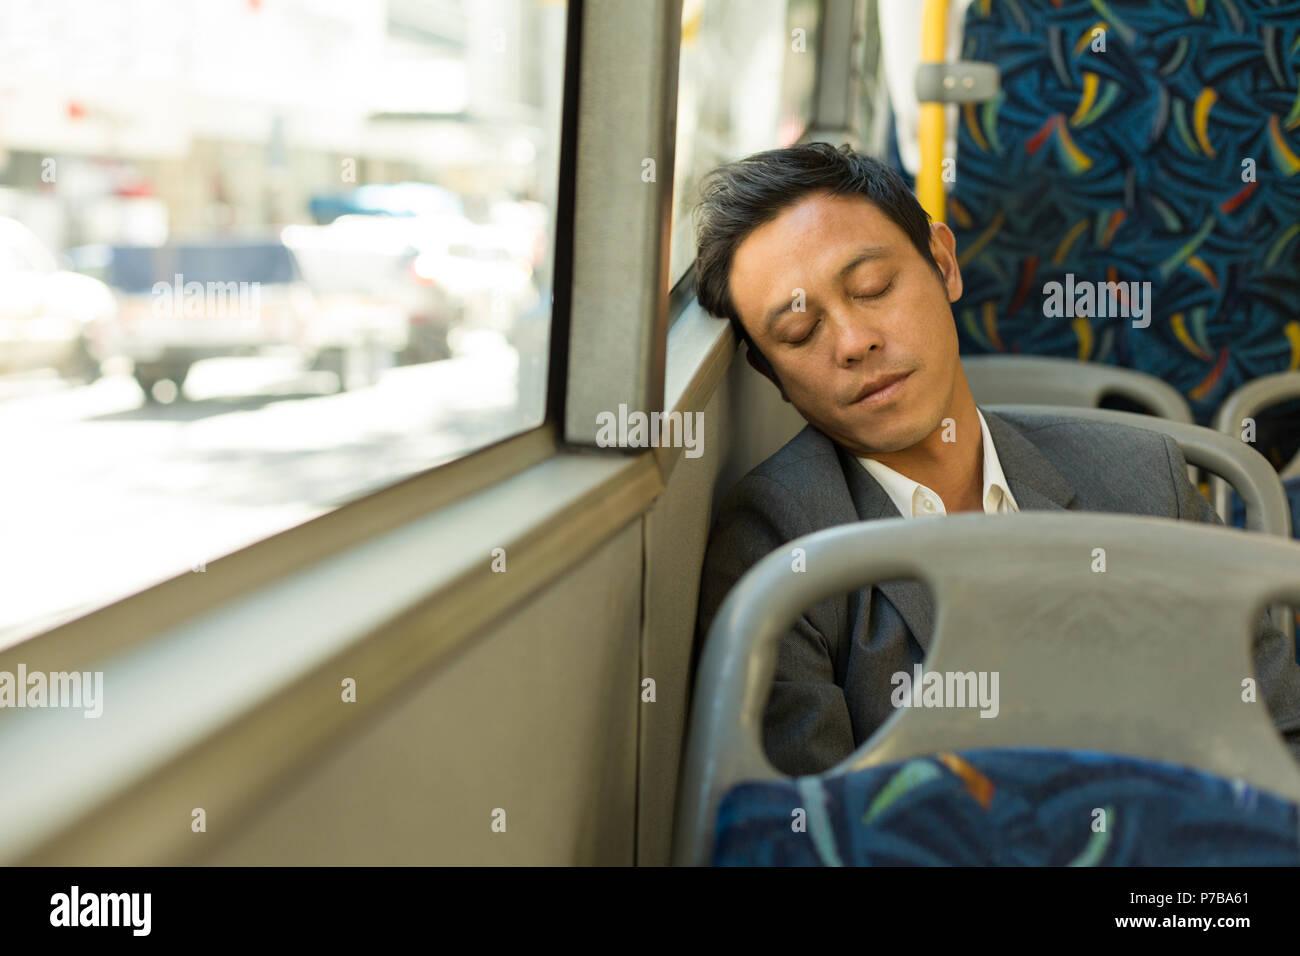 Uomo dorme in bus Immagini Stock